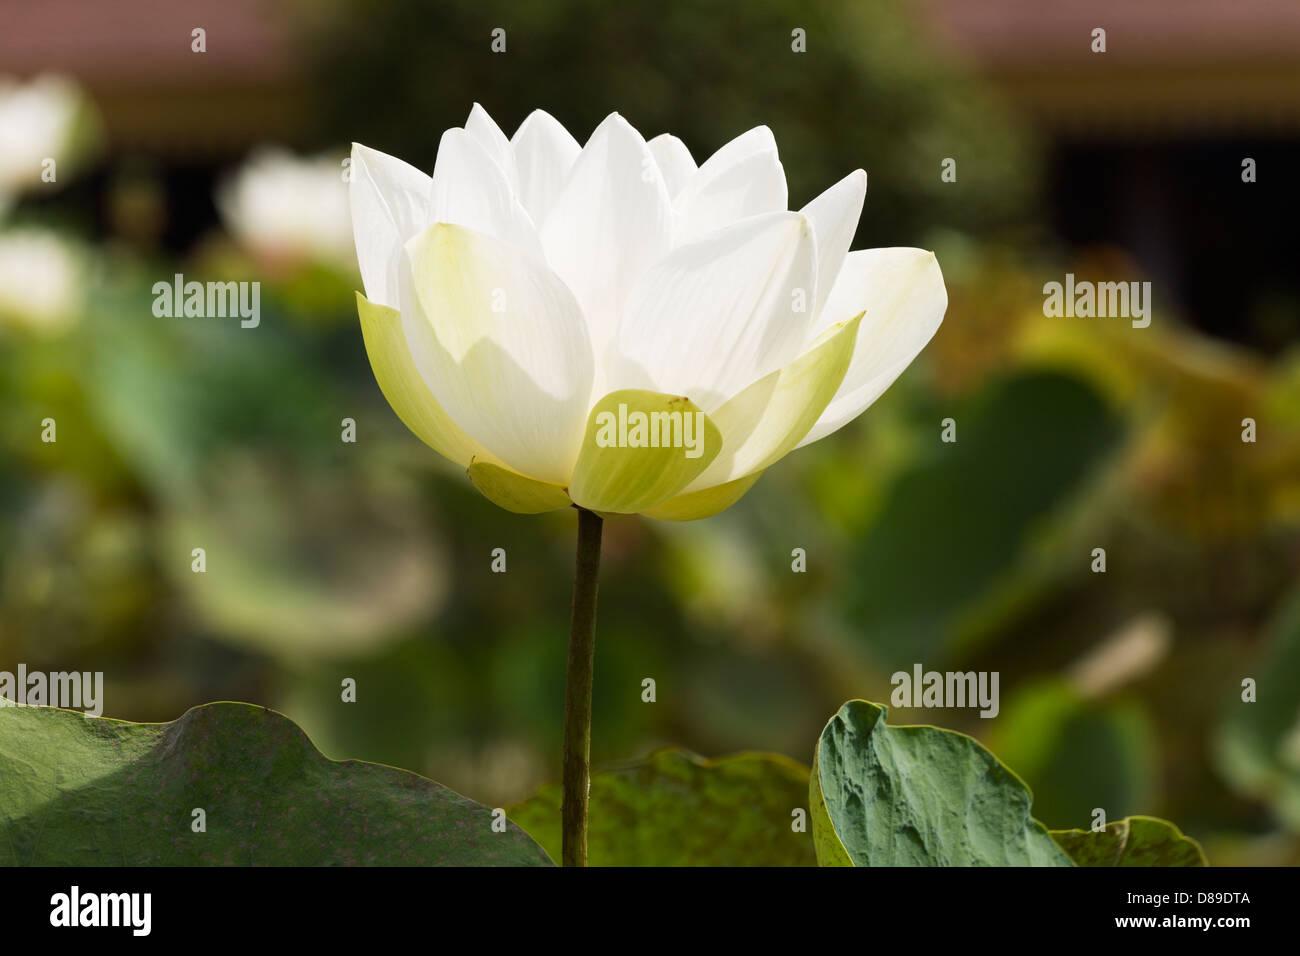 White Lotus Flower Nelumbo Nucifera In A Pond Inside The Royal